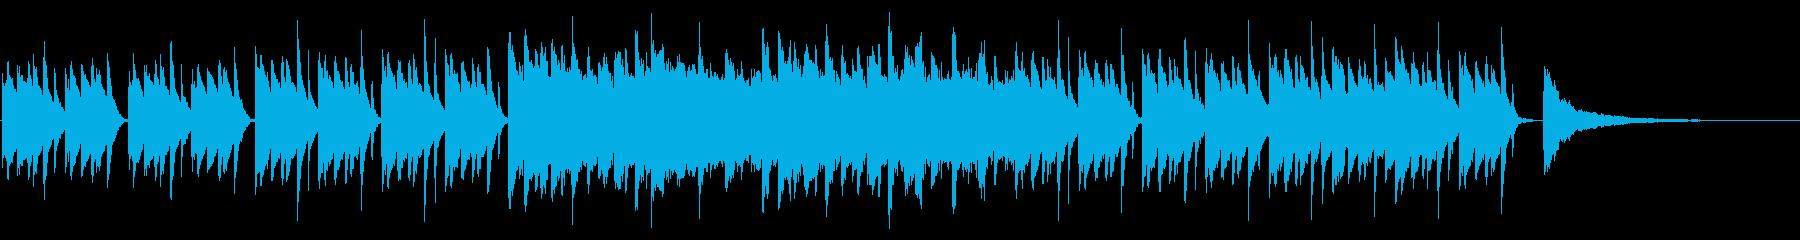 SNS広告 ピアノメイン ミニマル2の再生済みの波形